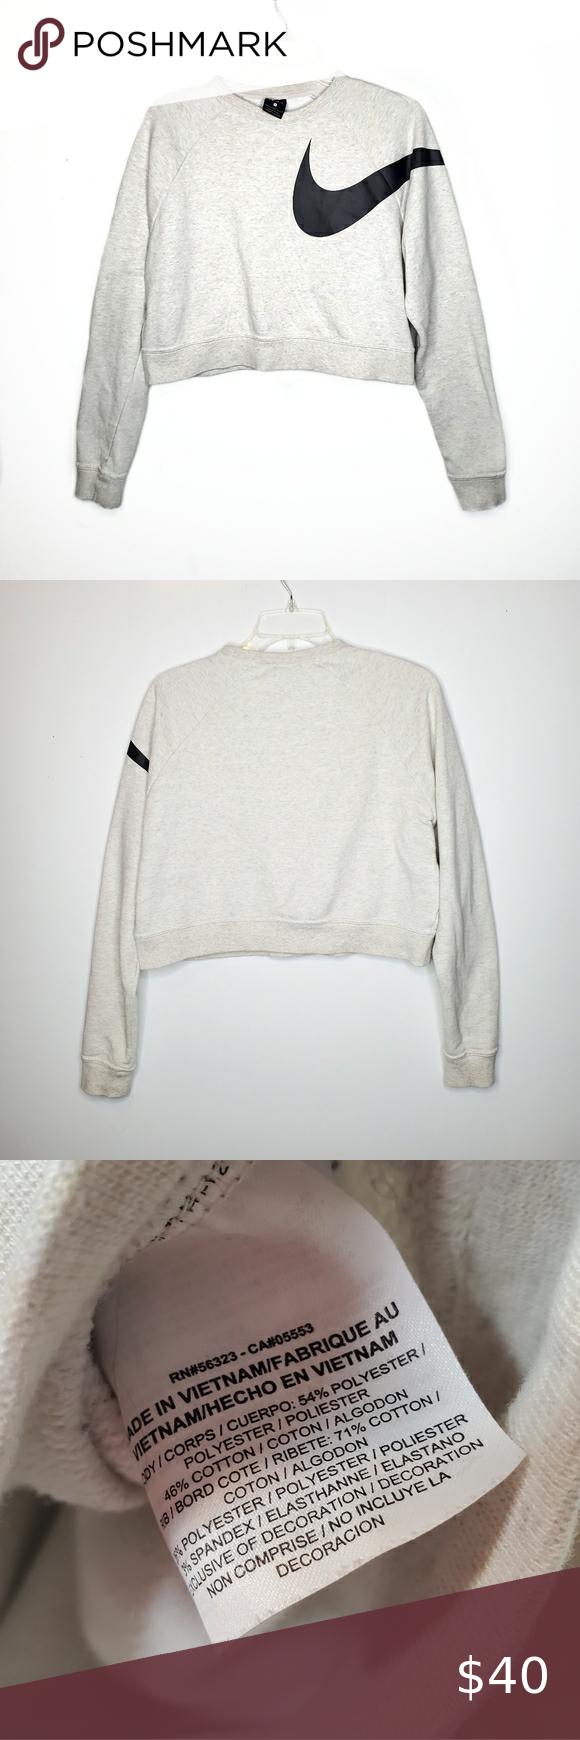 Nike Dri Fit Versa Cropped Sweatshirt Swoosh Logo Crop Sweatshirt Nike Dri Fit Sweatshirts [ 1740 x 580 Pixel ]